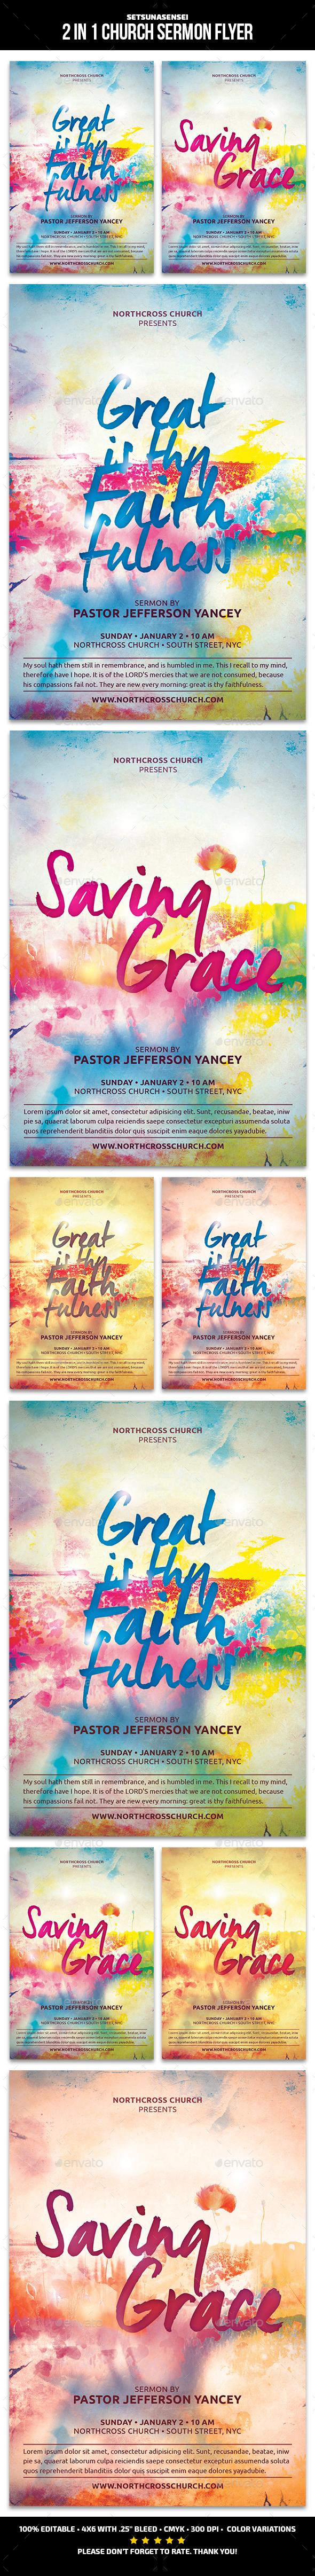 2 in 1 Church Sermon Flyer - Church Flyers